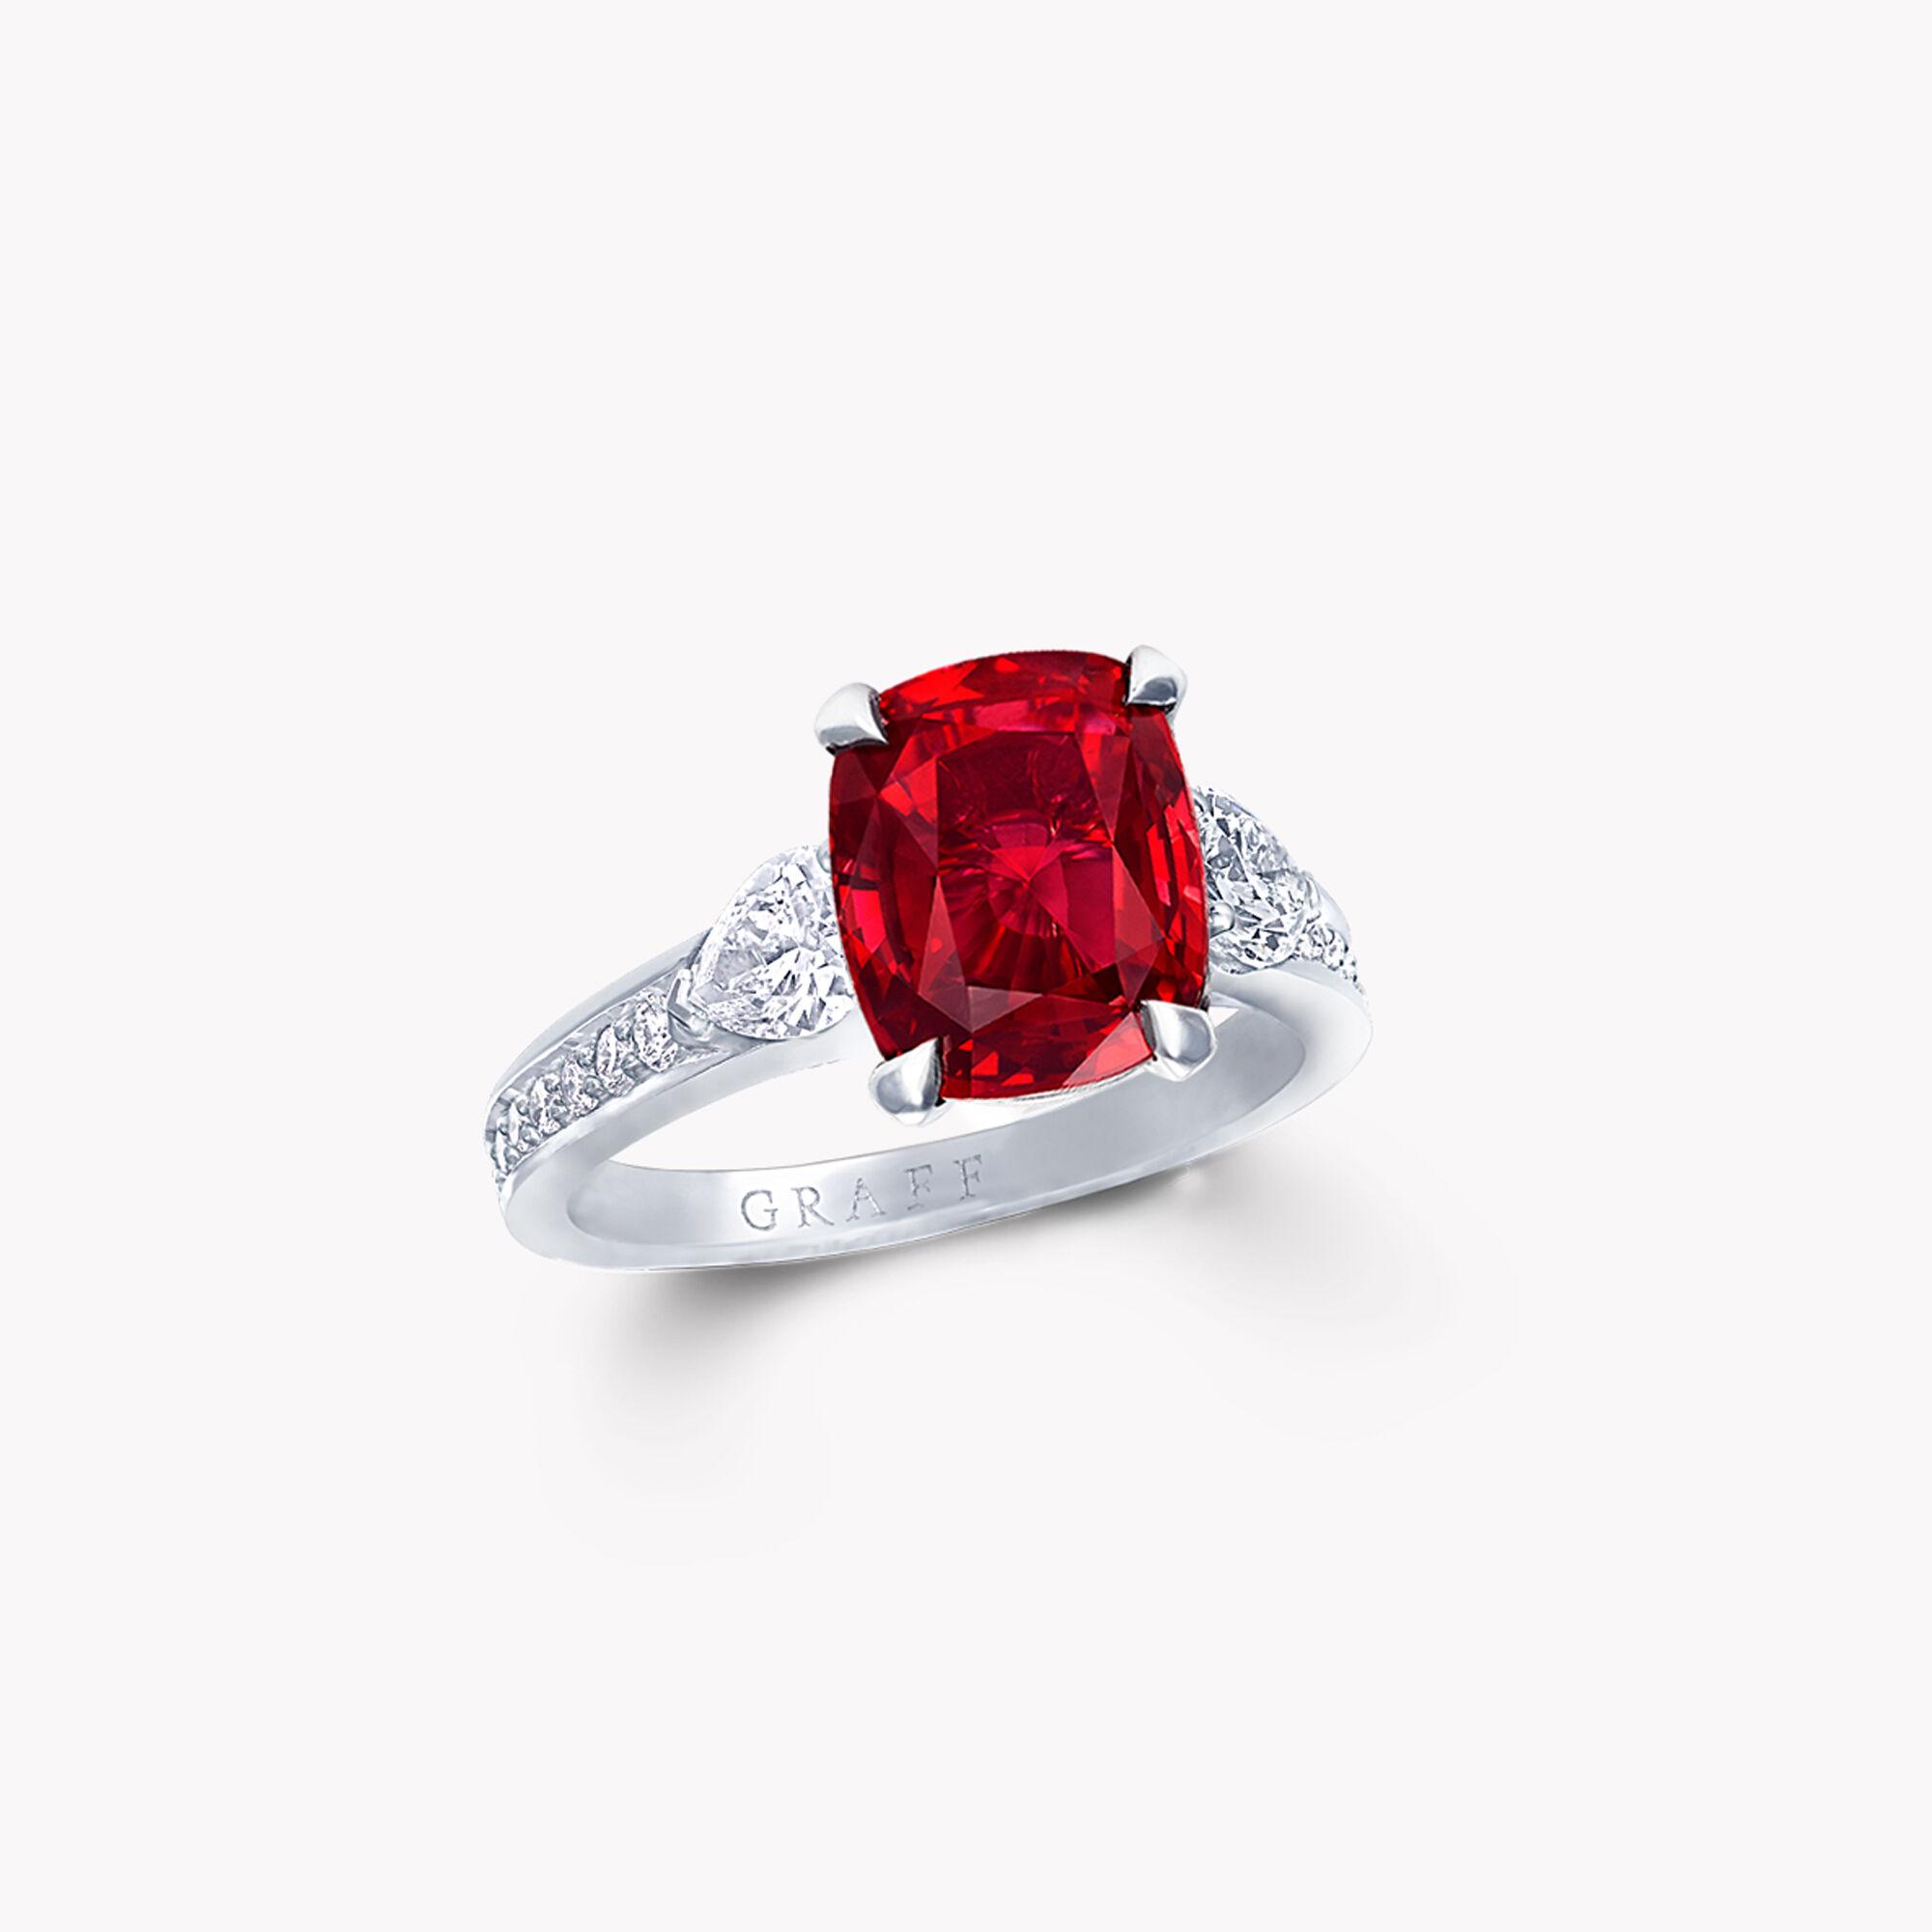 A Graff ruby and white diamond high jewellery bracelet